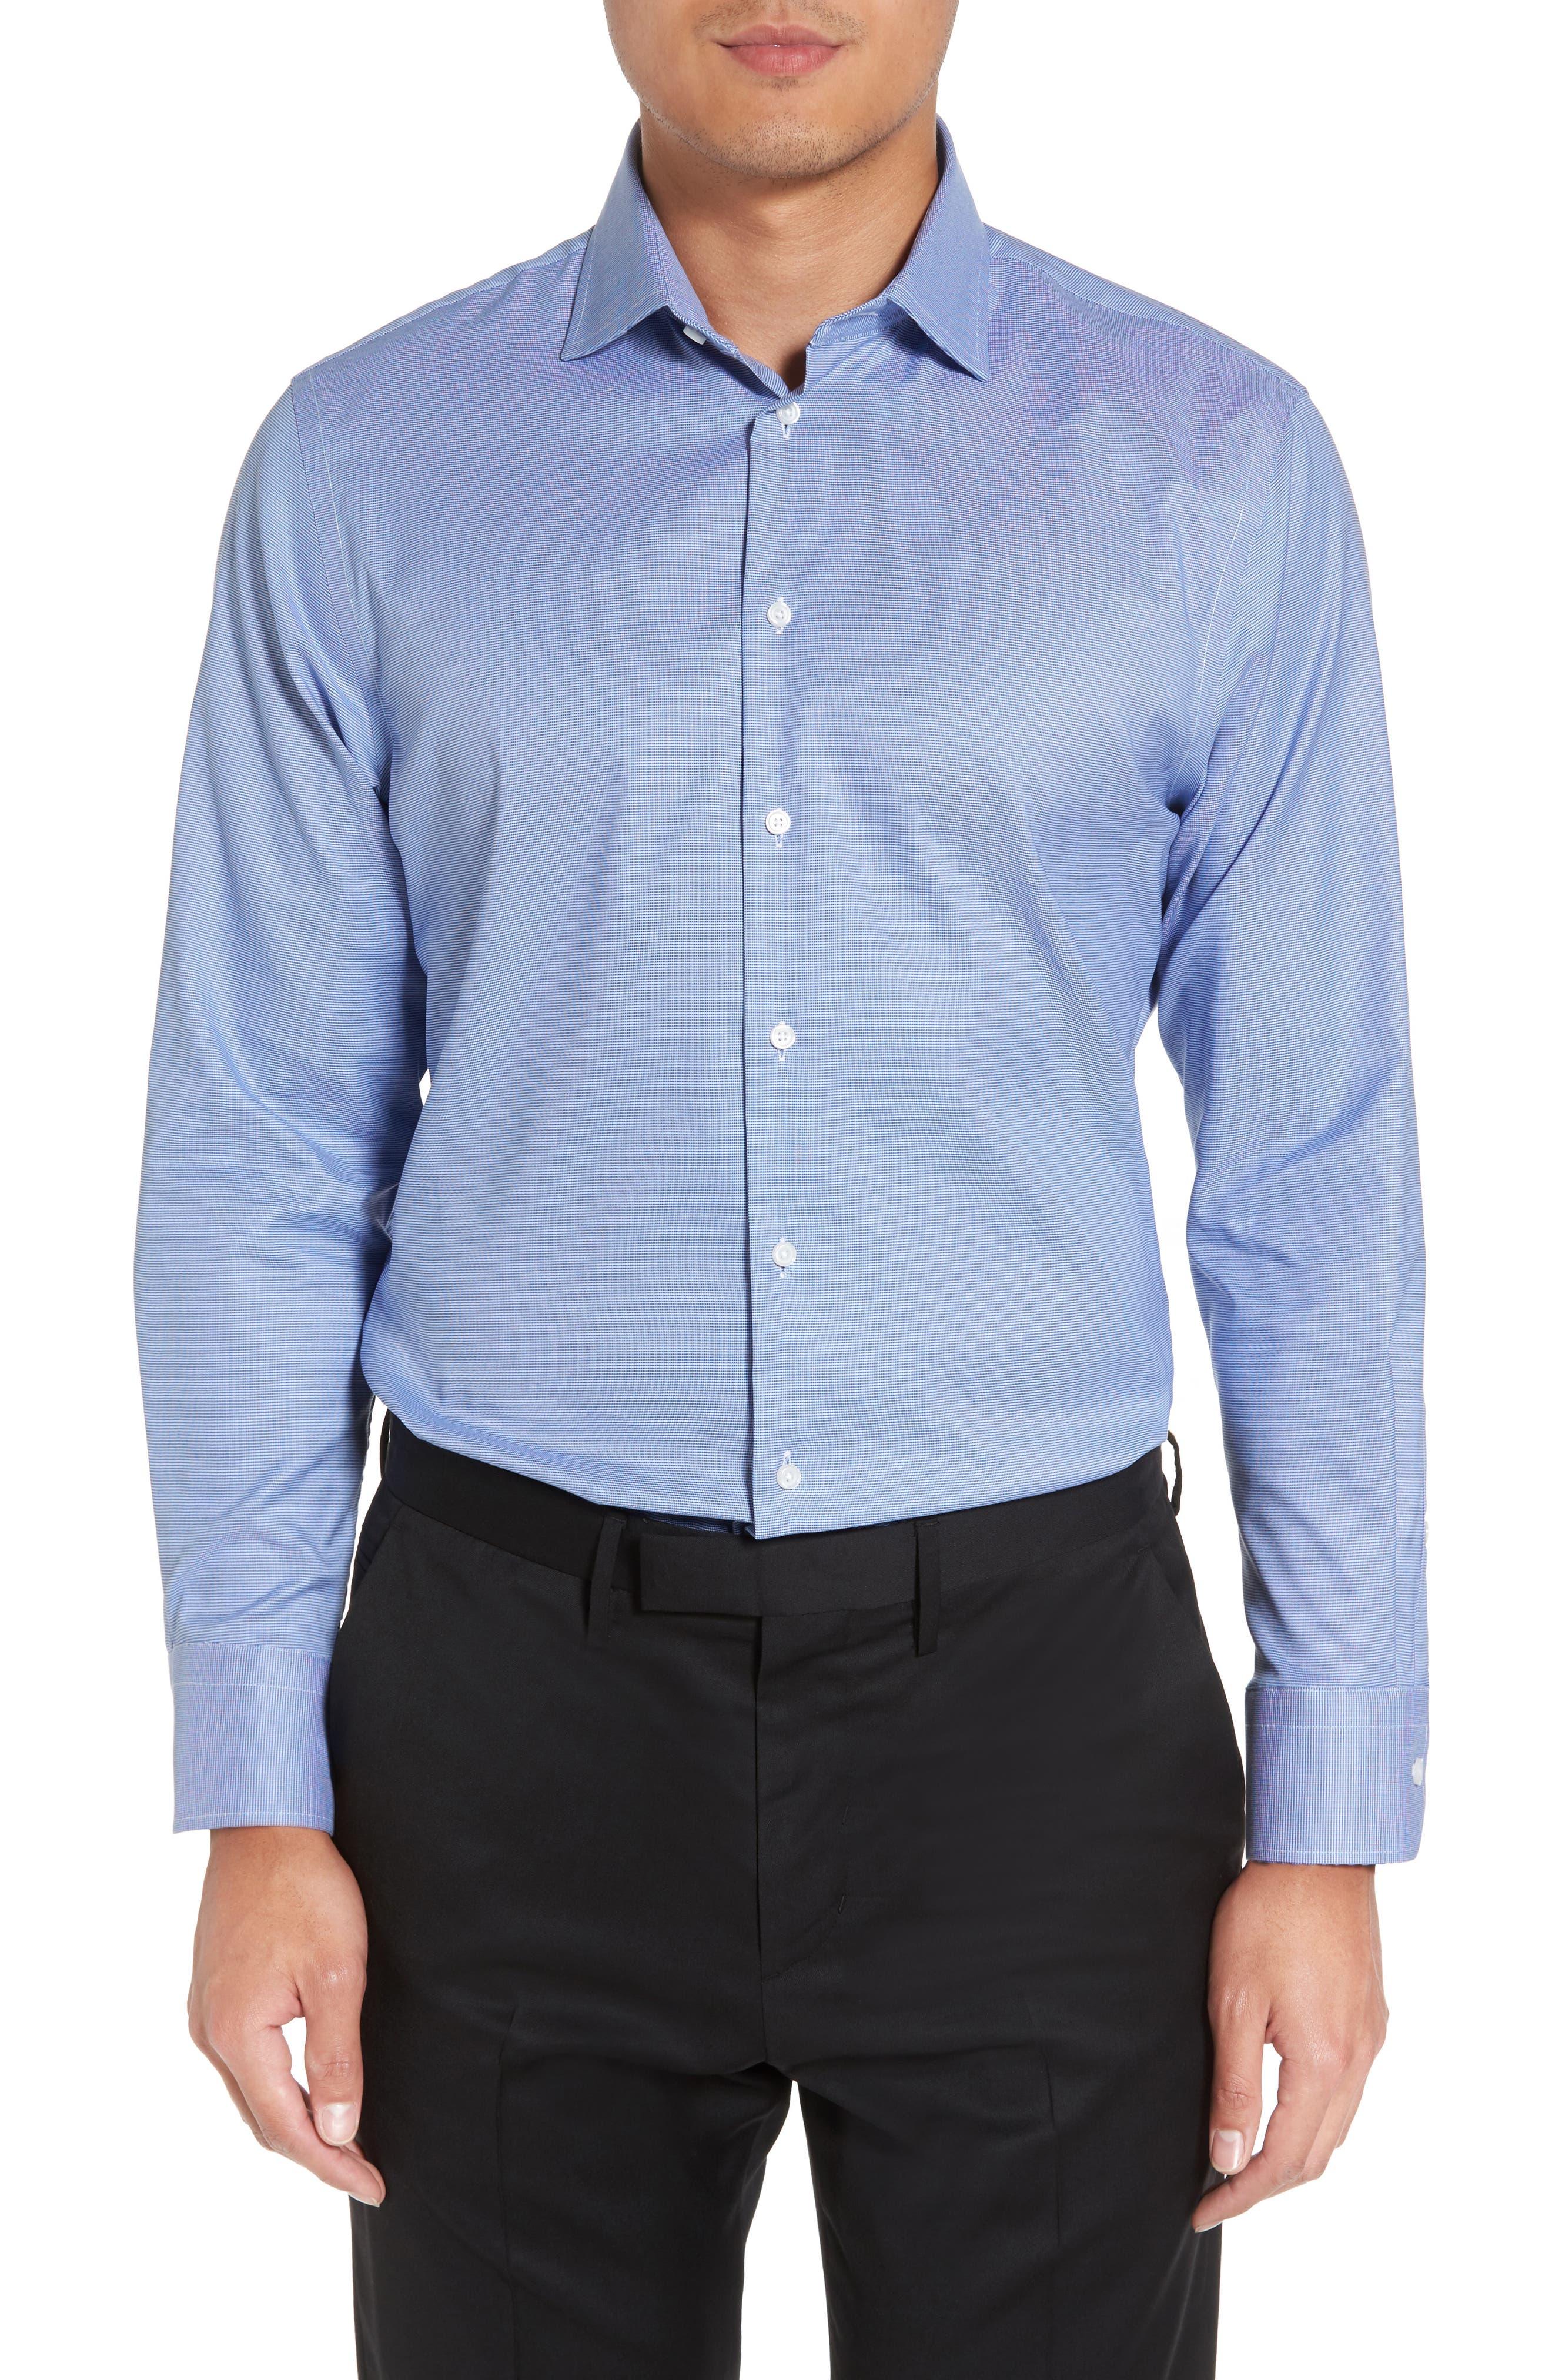 Trim Fit Non-Iron Dress Shirt,                         Main,                         color, Blue Sodalite